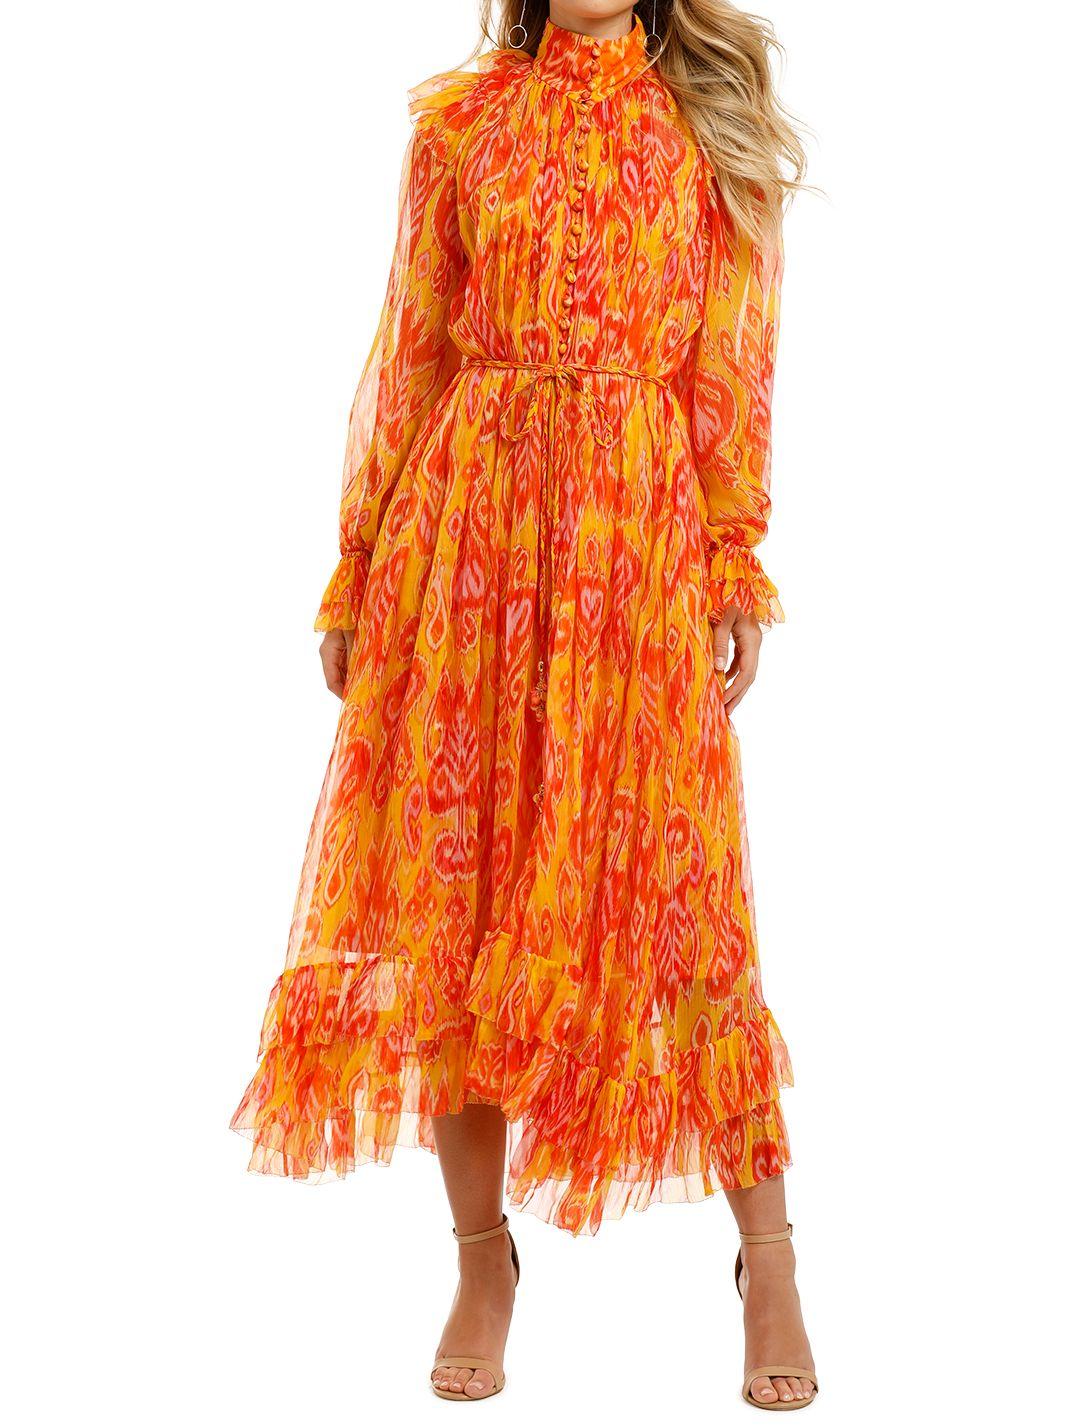 Zimmermann-Brightside-Frilled-Midi-Dress-Golden-Ikat-Front